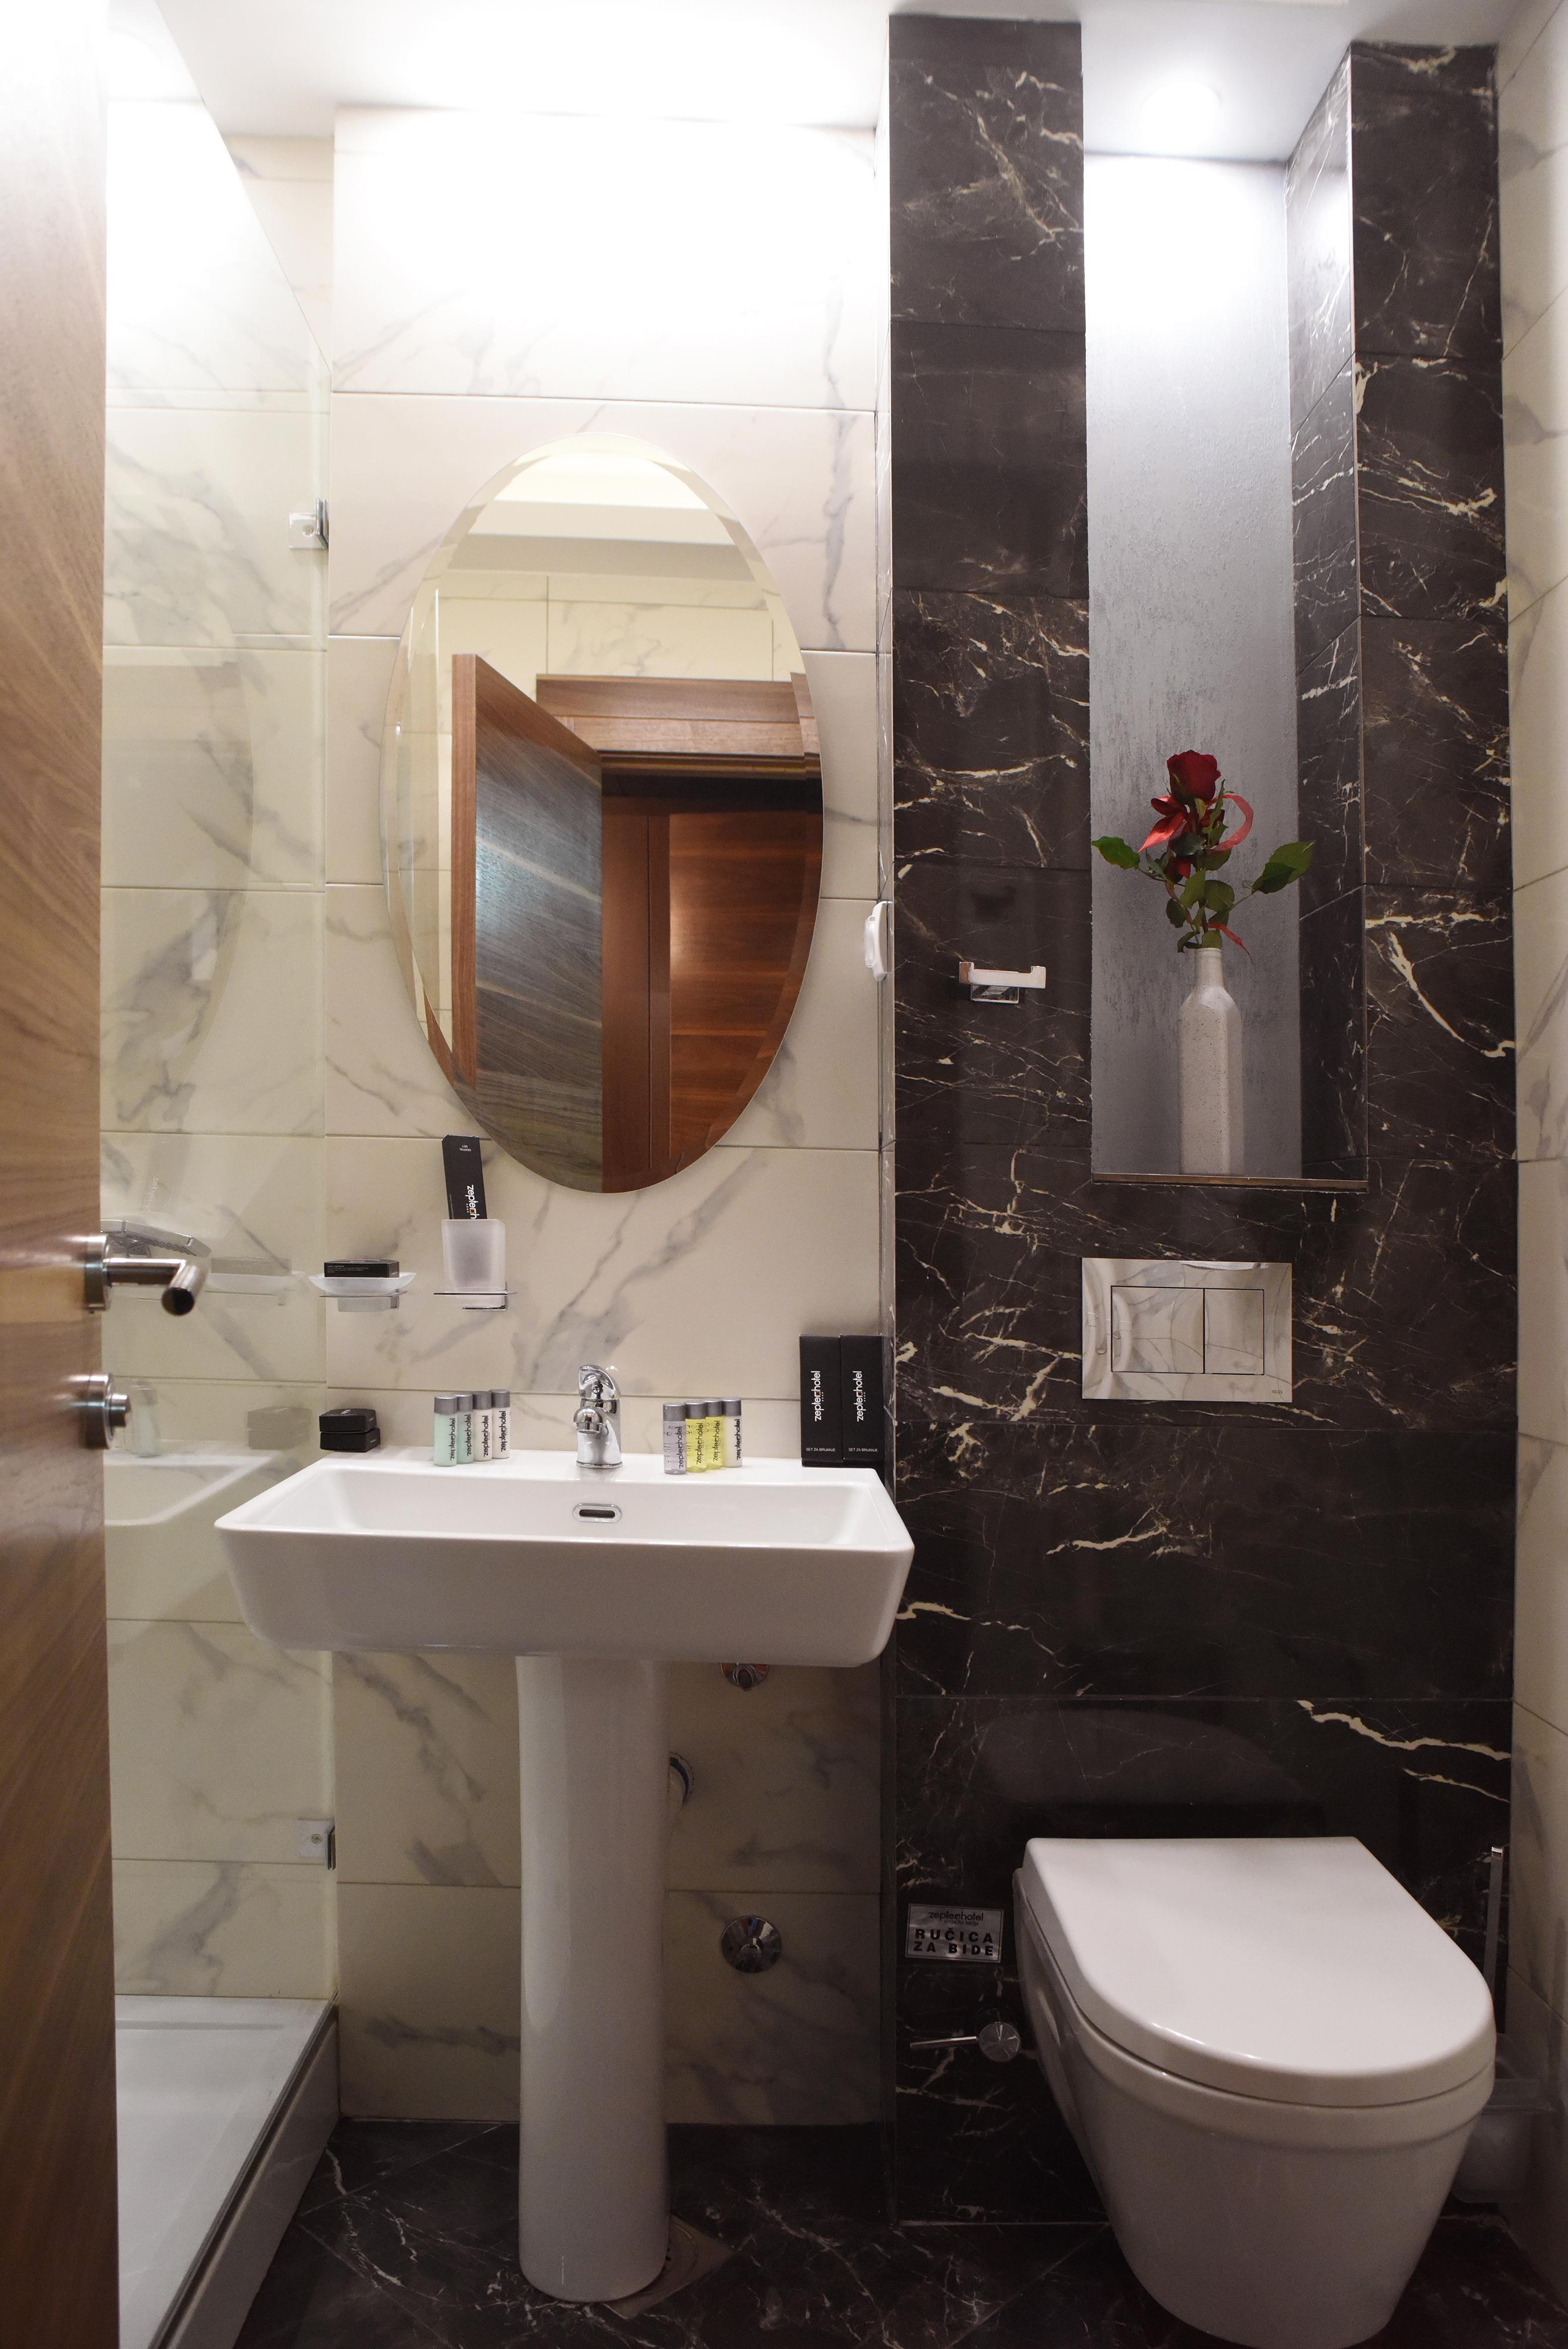 Kupatilo u lux sobi, Zepter Hotel Vrnjačka Banja